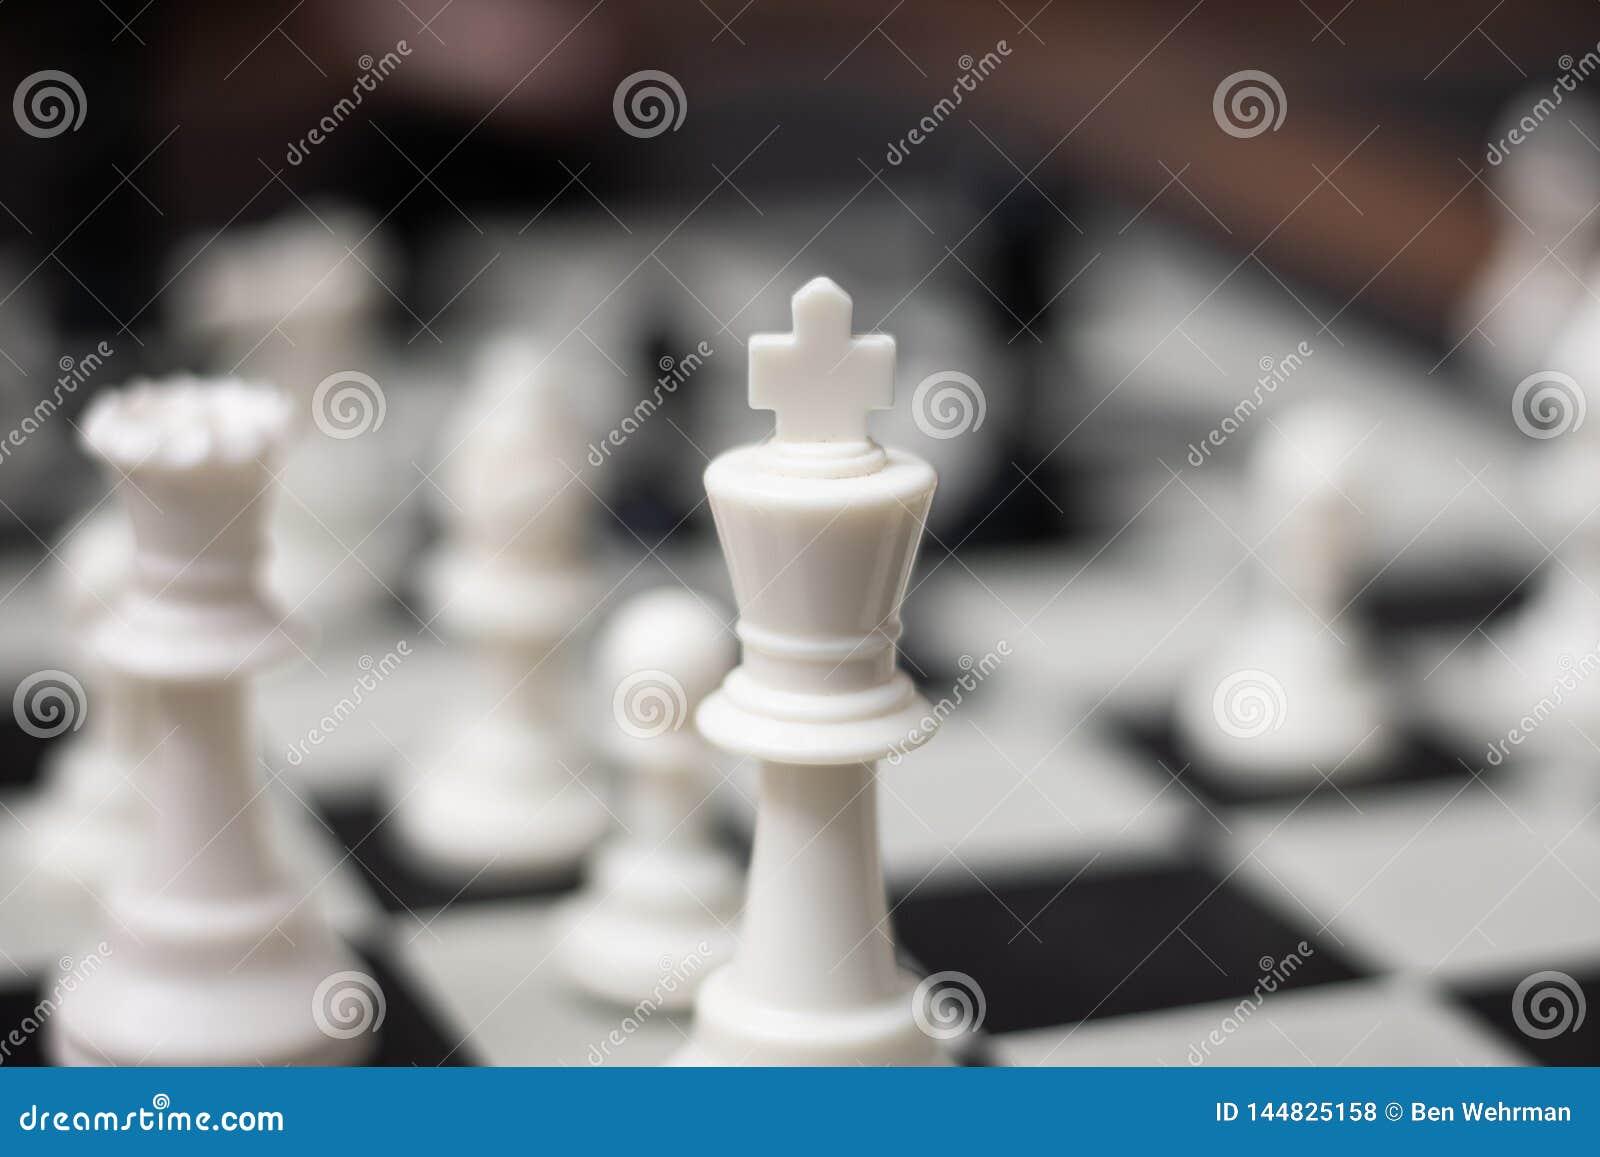 Rey Chess Game Piece